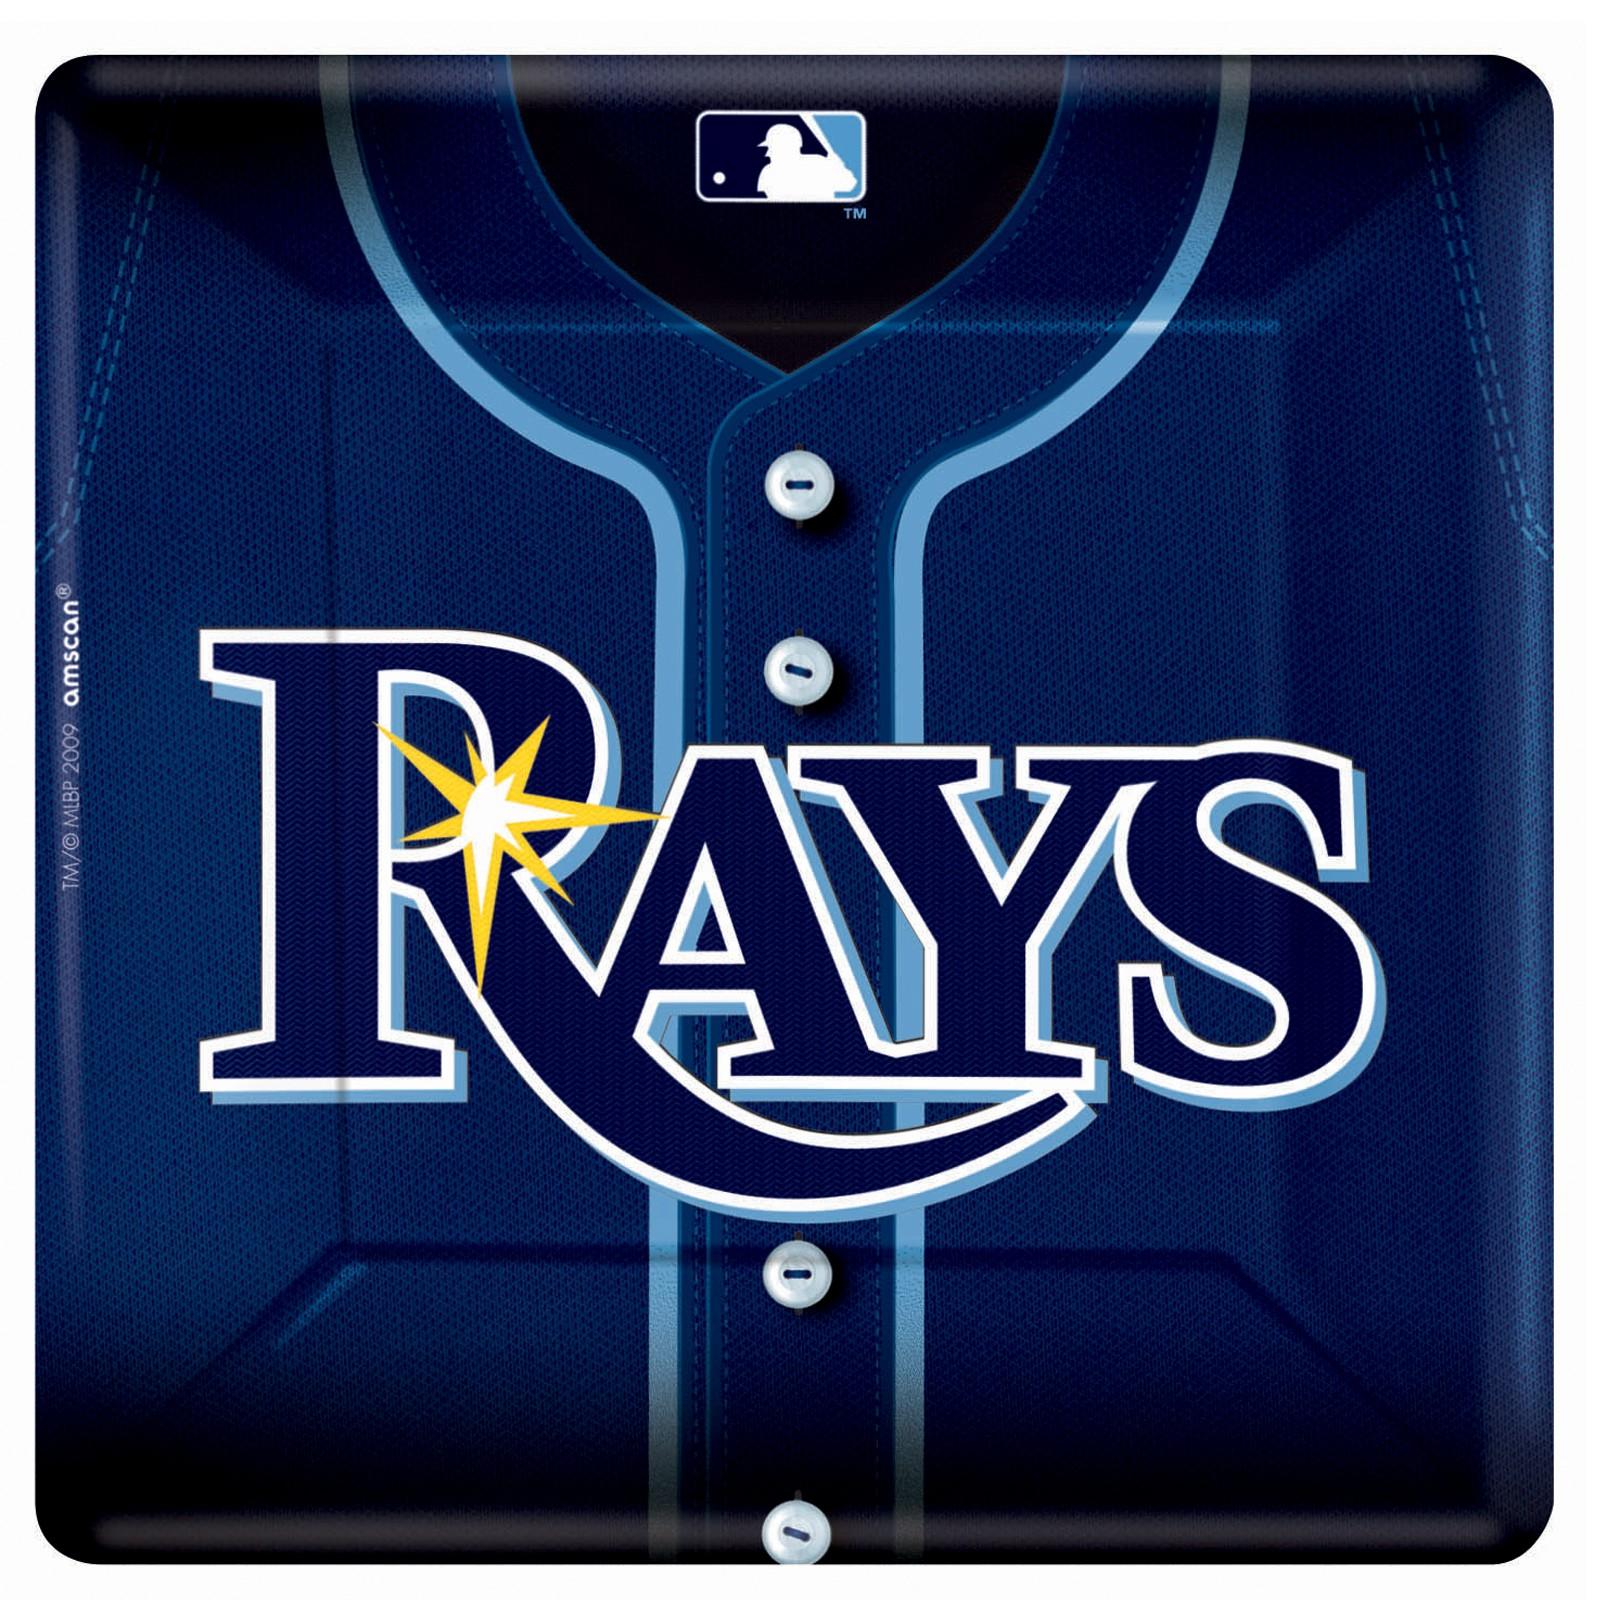 TAMPA BAY RAYS baseball mlb h wallpaper background 1600x1600